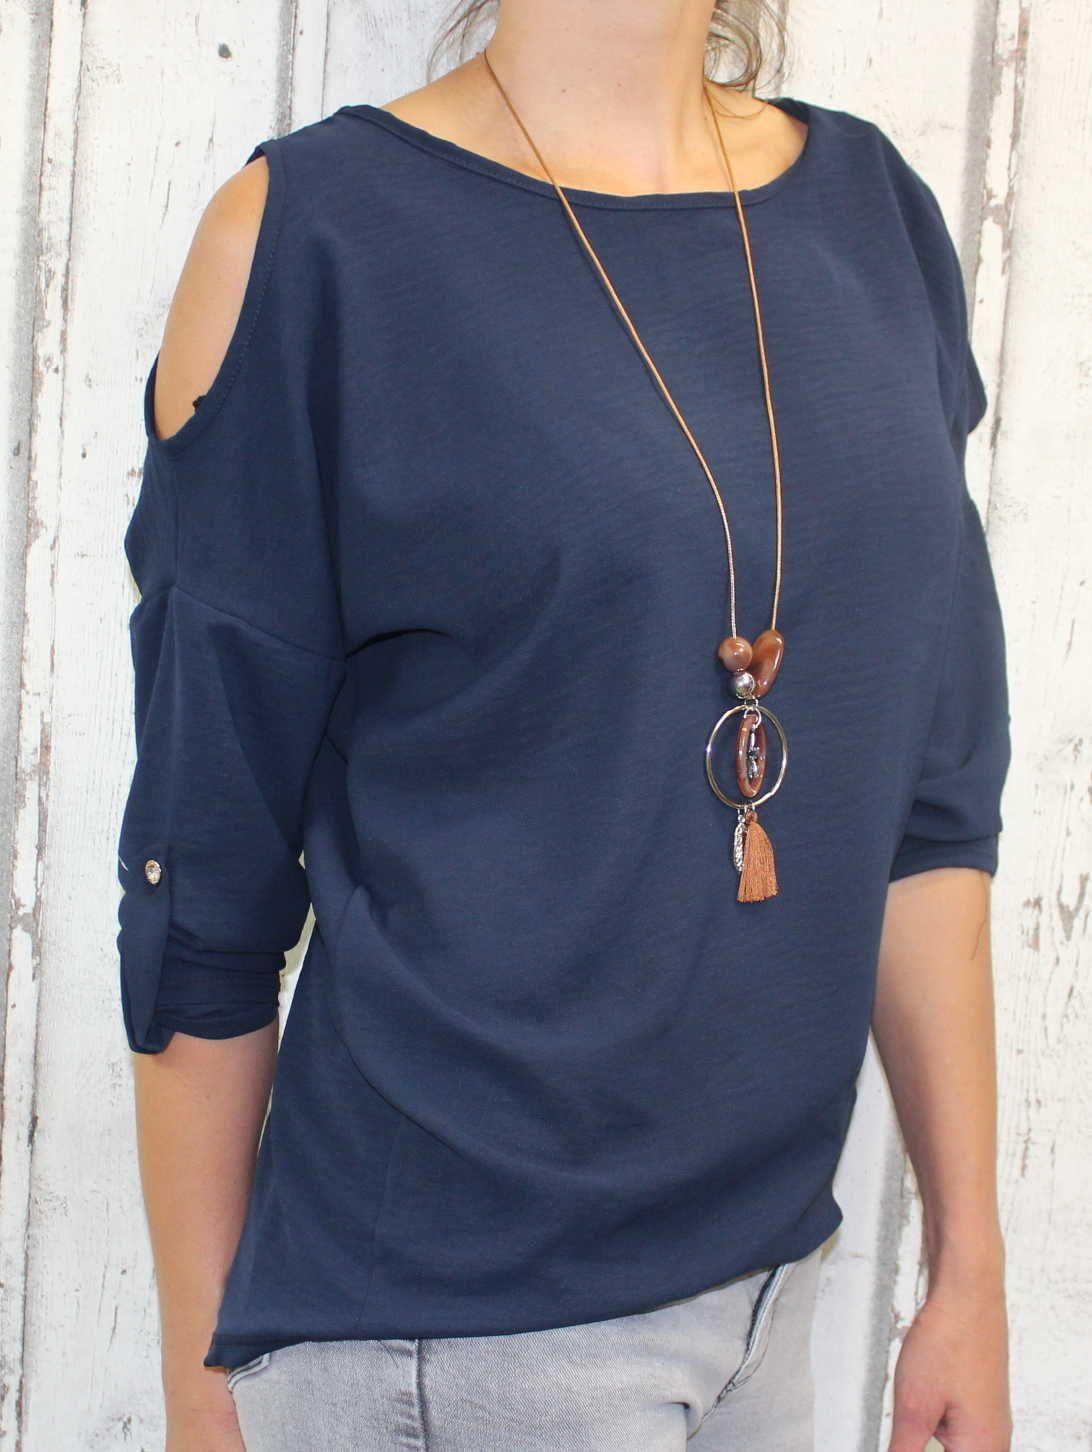 Dámská tunika, dámské tričko volný střih, dámská halenka tričko s výstřihem na ramenou, modrá halenka Italy Moda